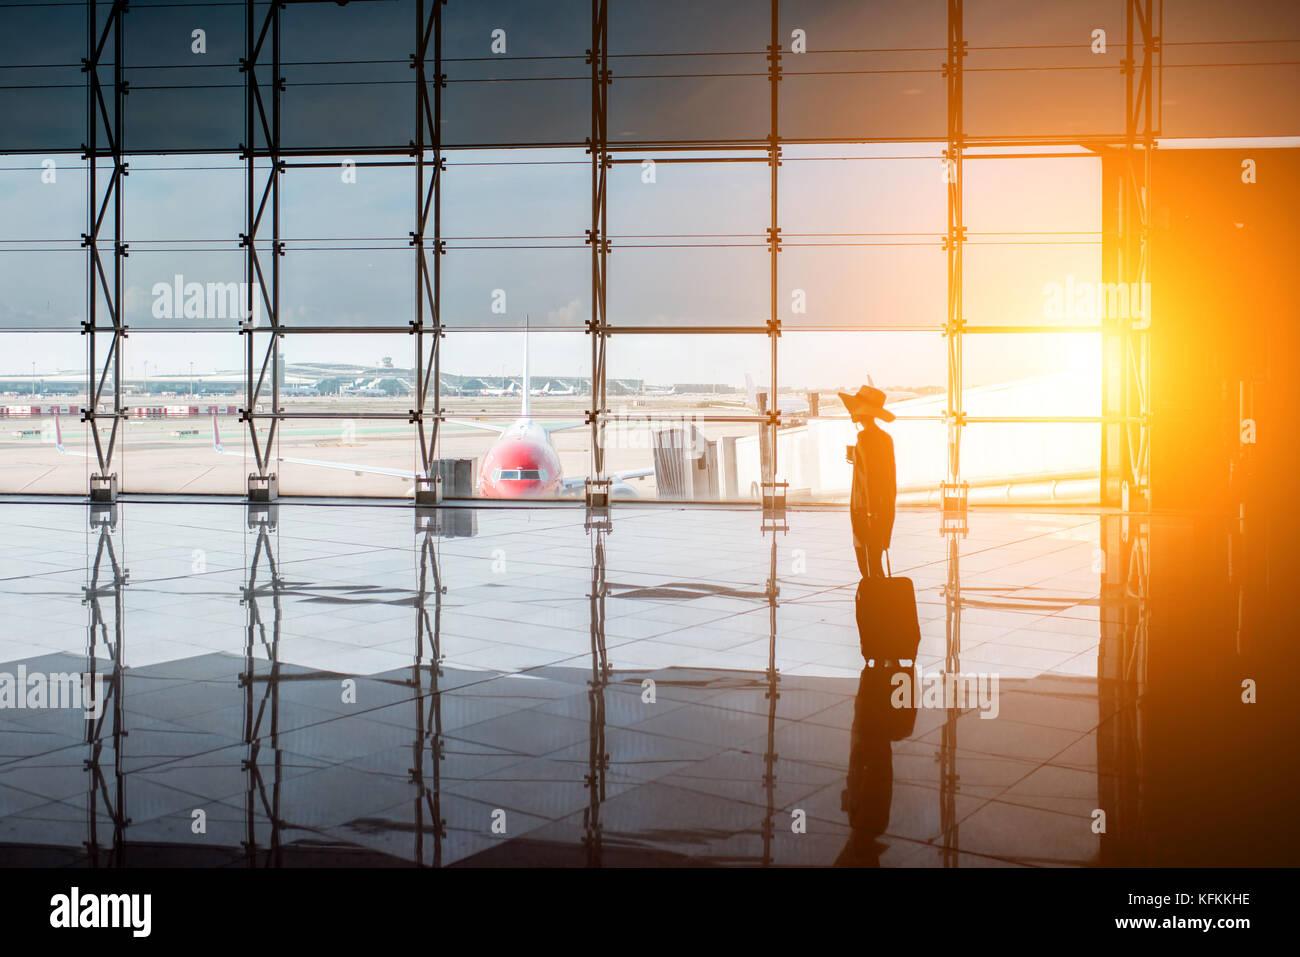 Woman near the airport window - Stock Image